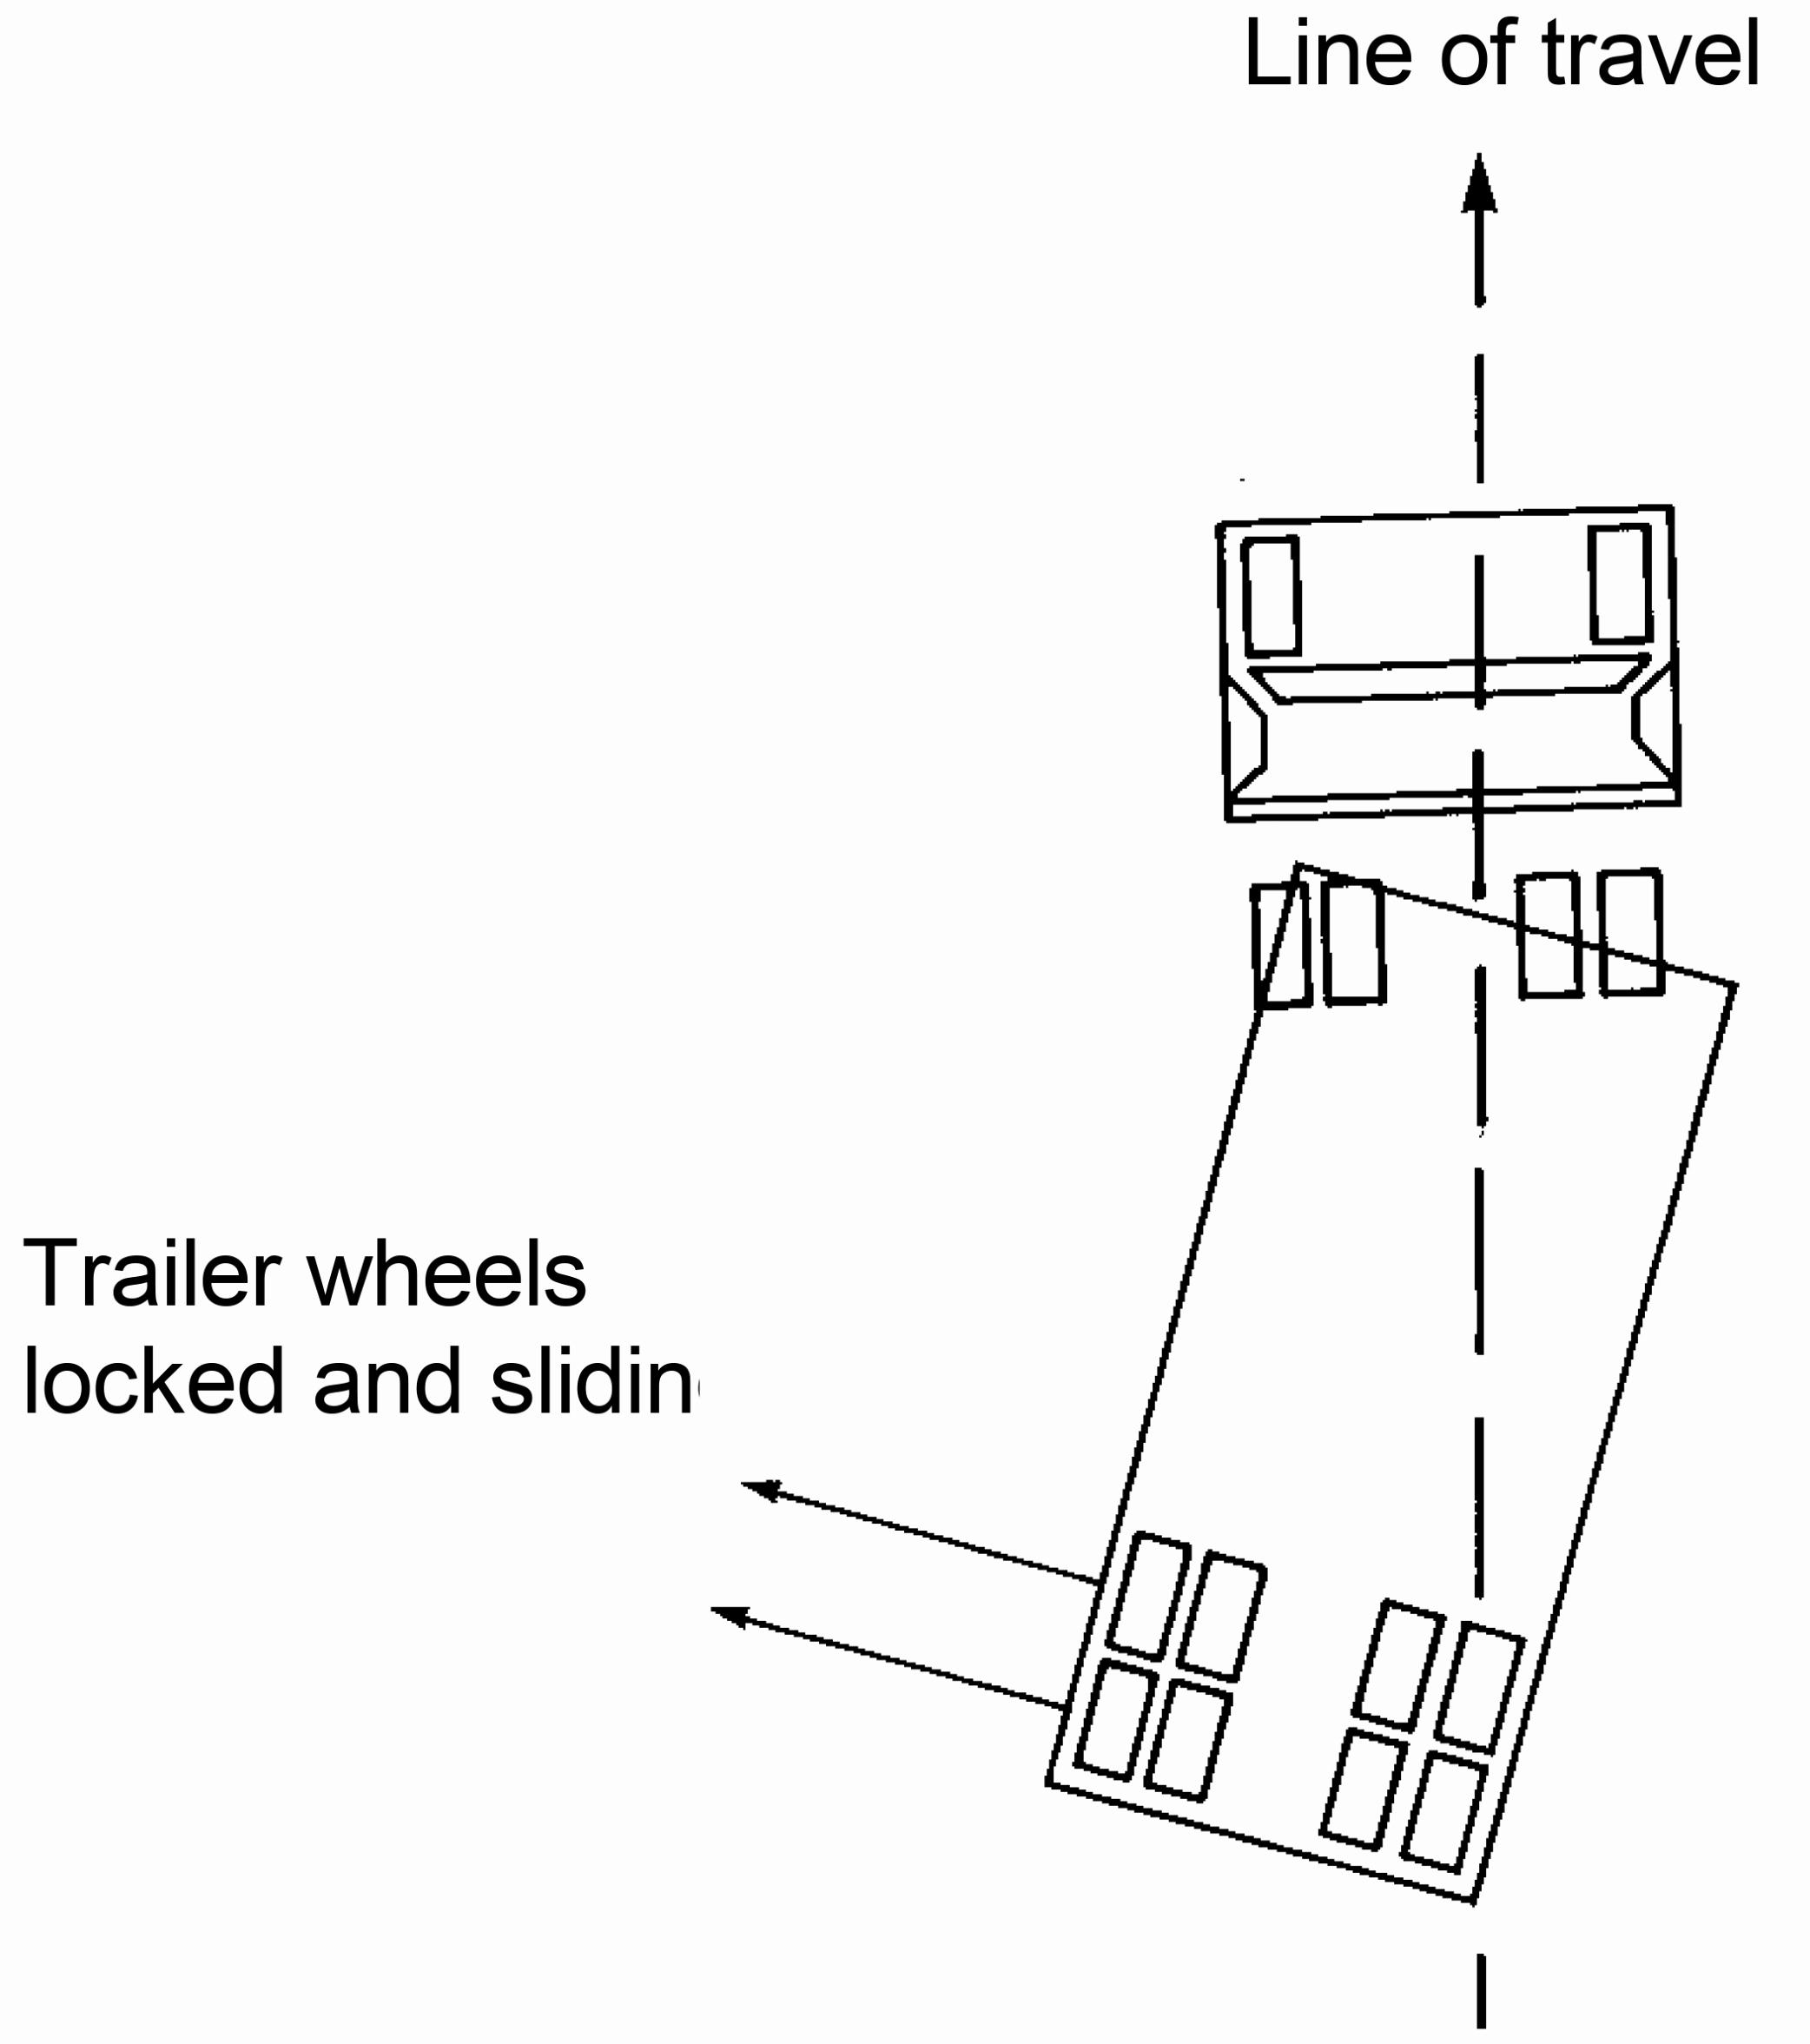 Tractor Trailer Pre Trip Inspection Diagram Dot Pre Trip Inspection Checklist Beautiful Dot Daily Vehicle